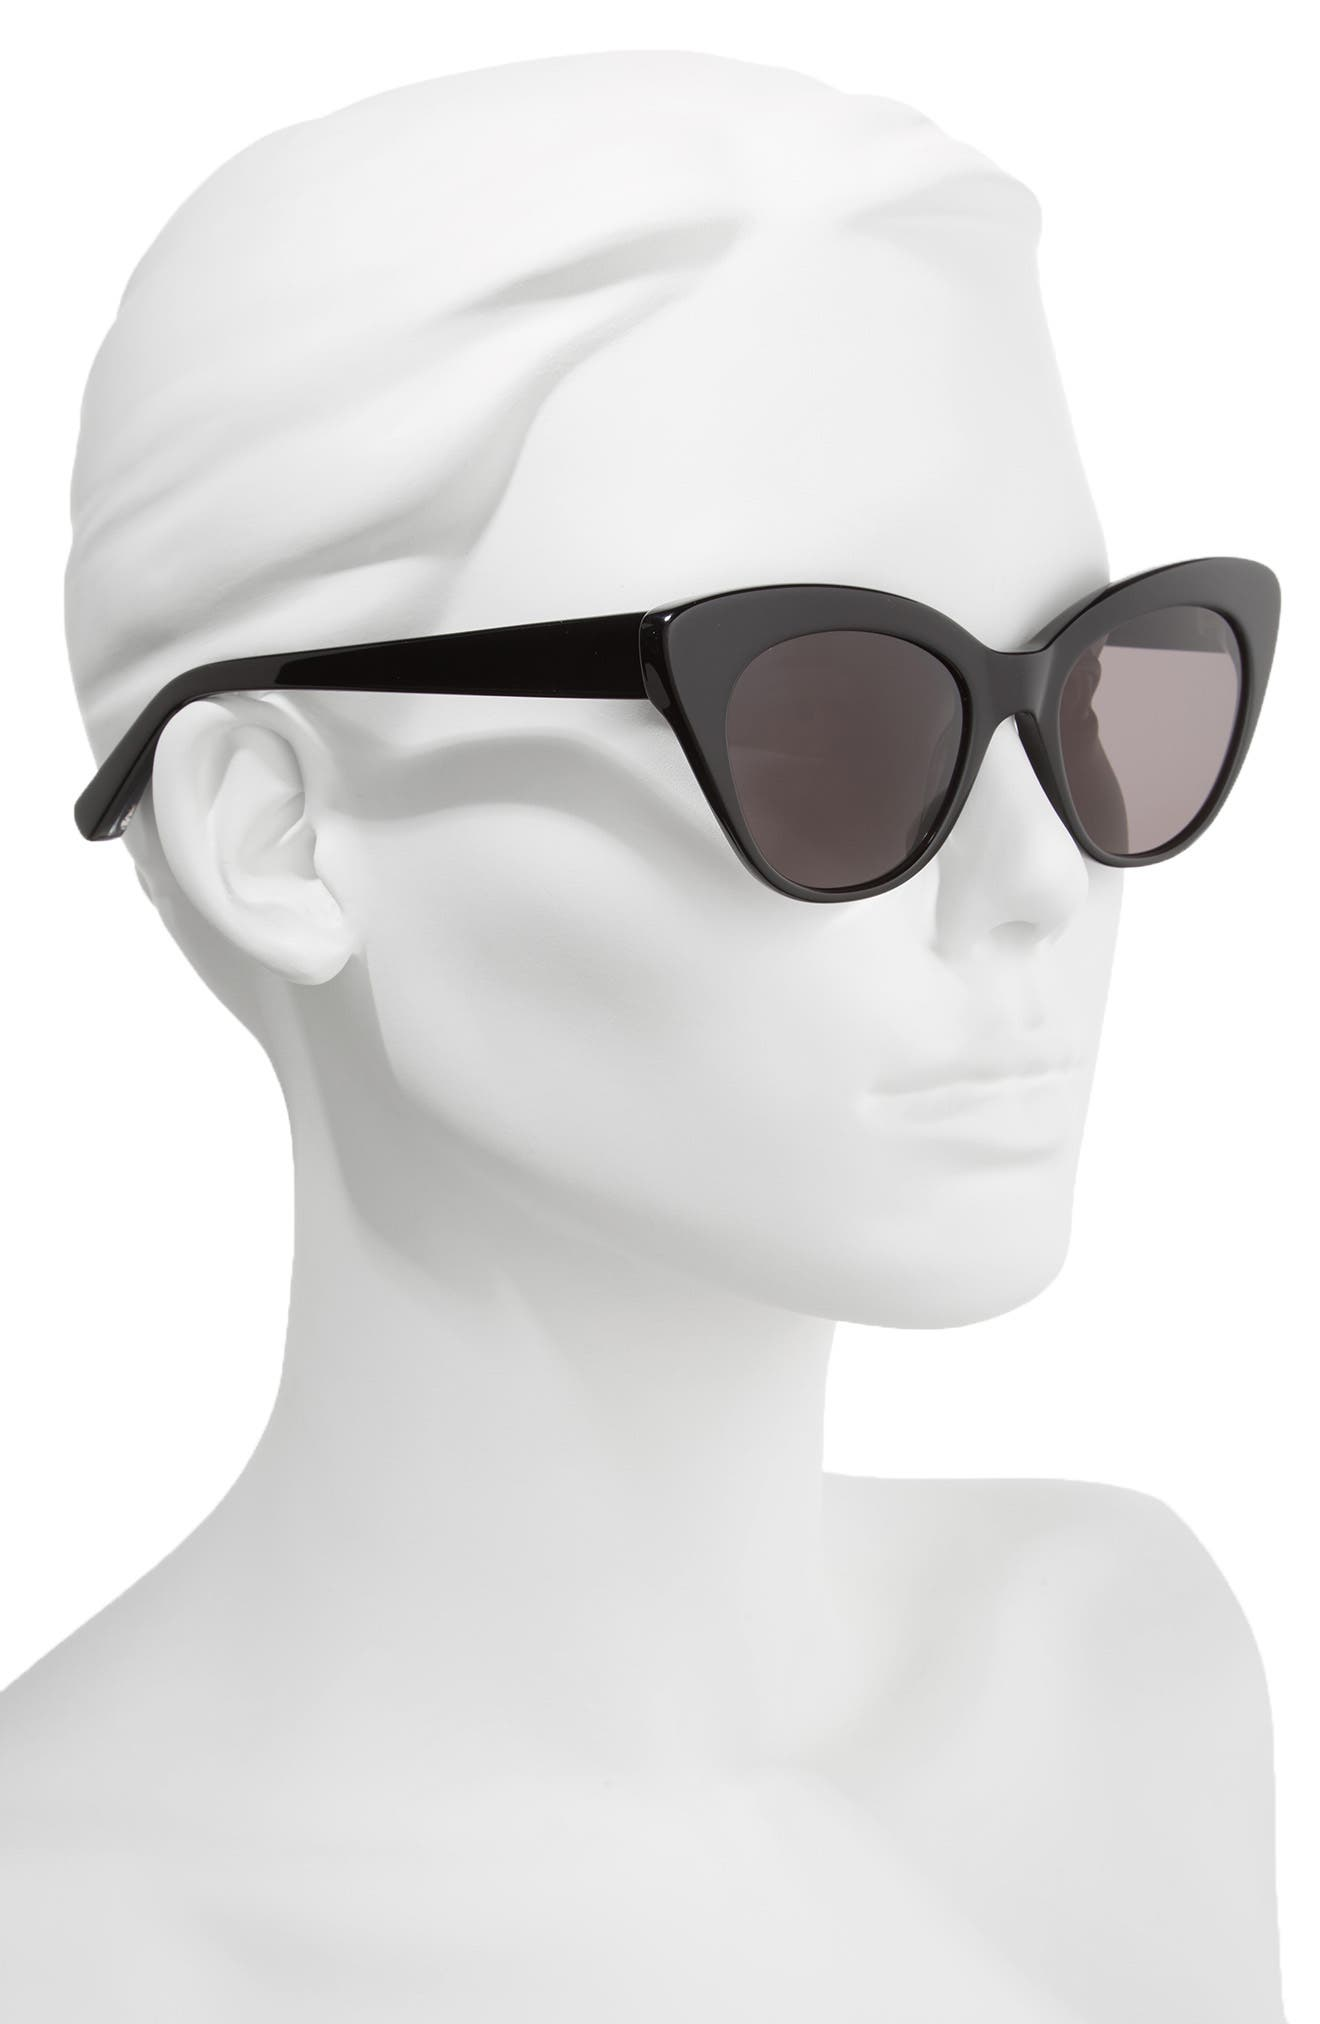 ELIZABETH AND JAMES, Vale 52mm Cat Eye Sunglasses, Alternate thumbnail 2, color, 020